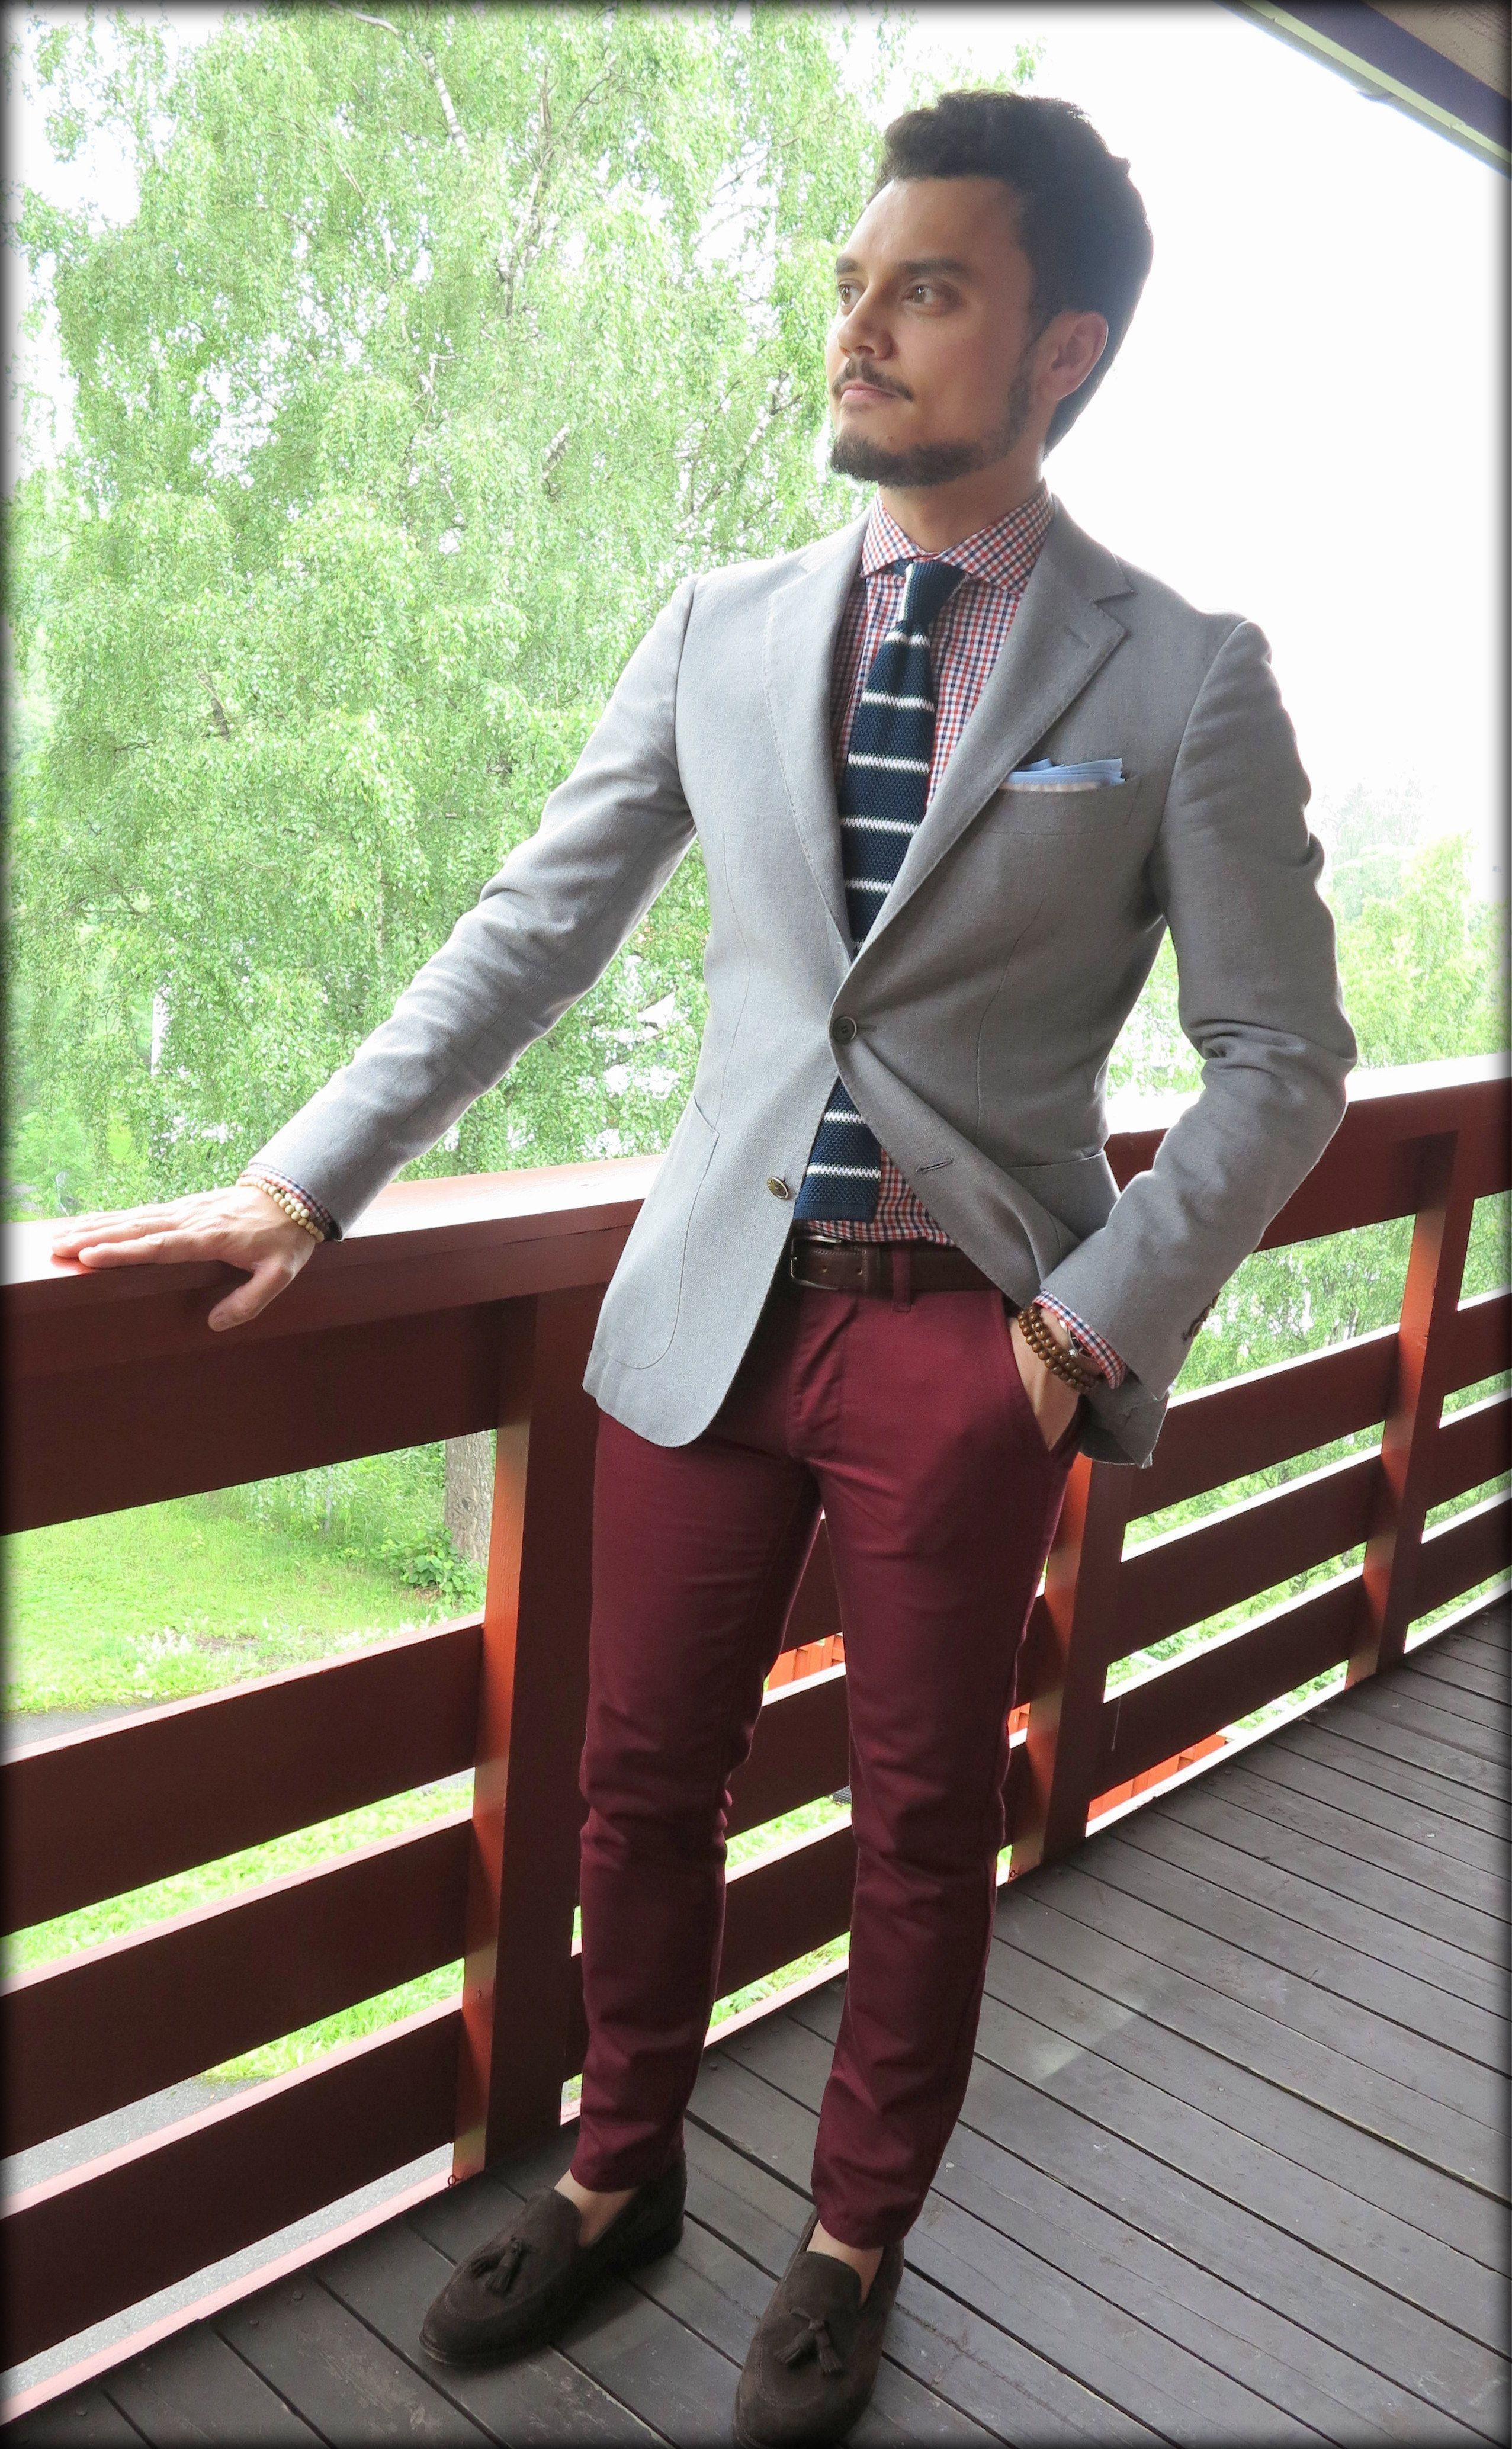 Burgundy Pants And Blue Shirt - Google Search | Men Suits | Pinterest | Burgundy Pants Burgundy ...